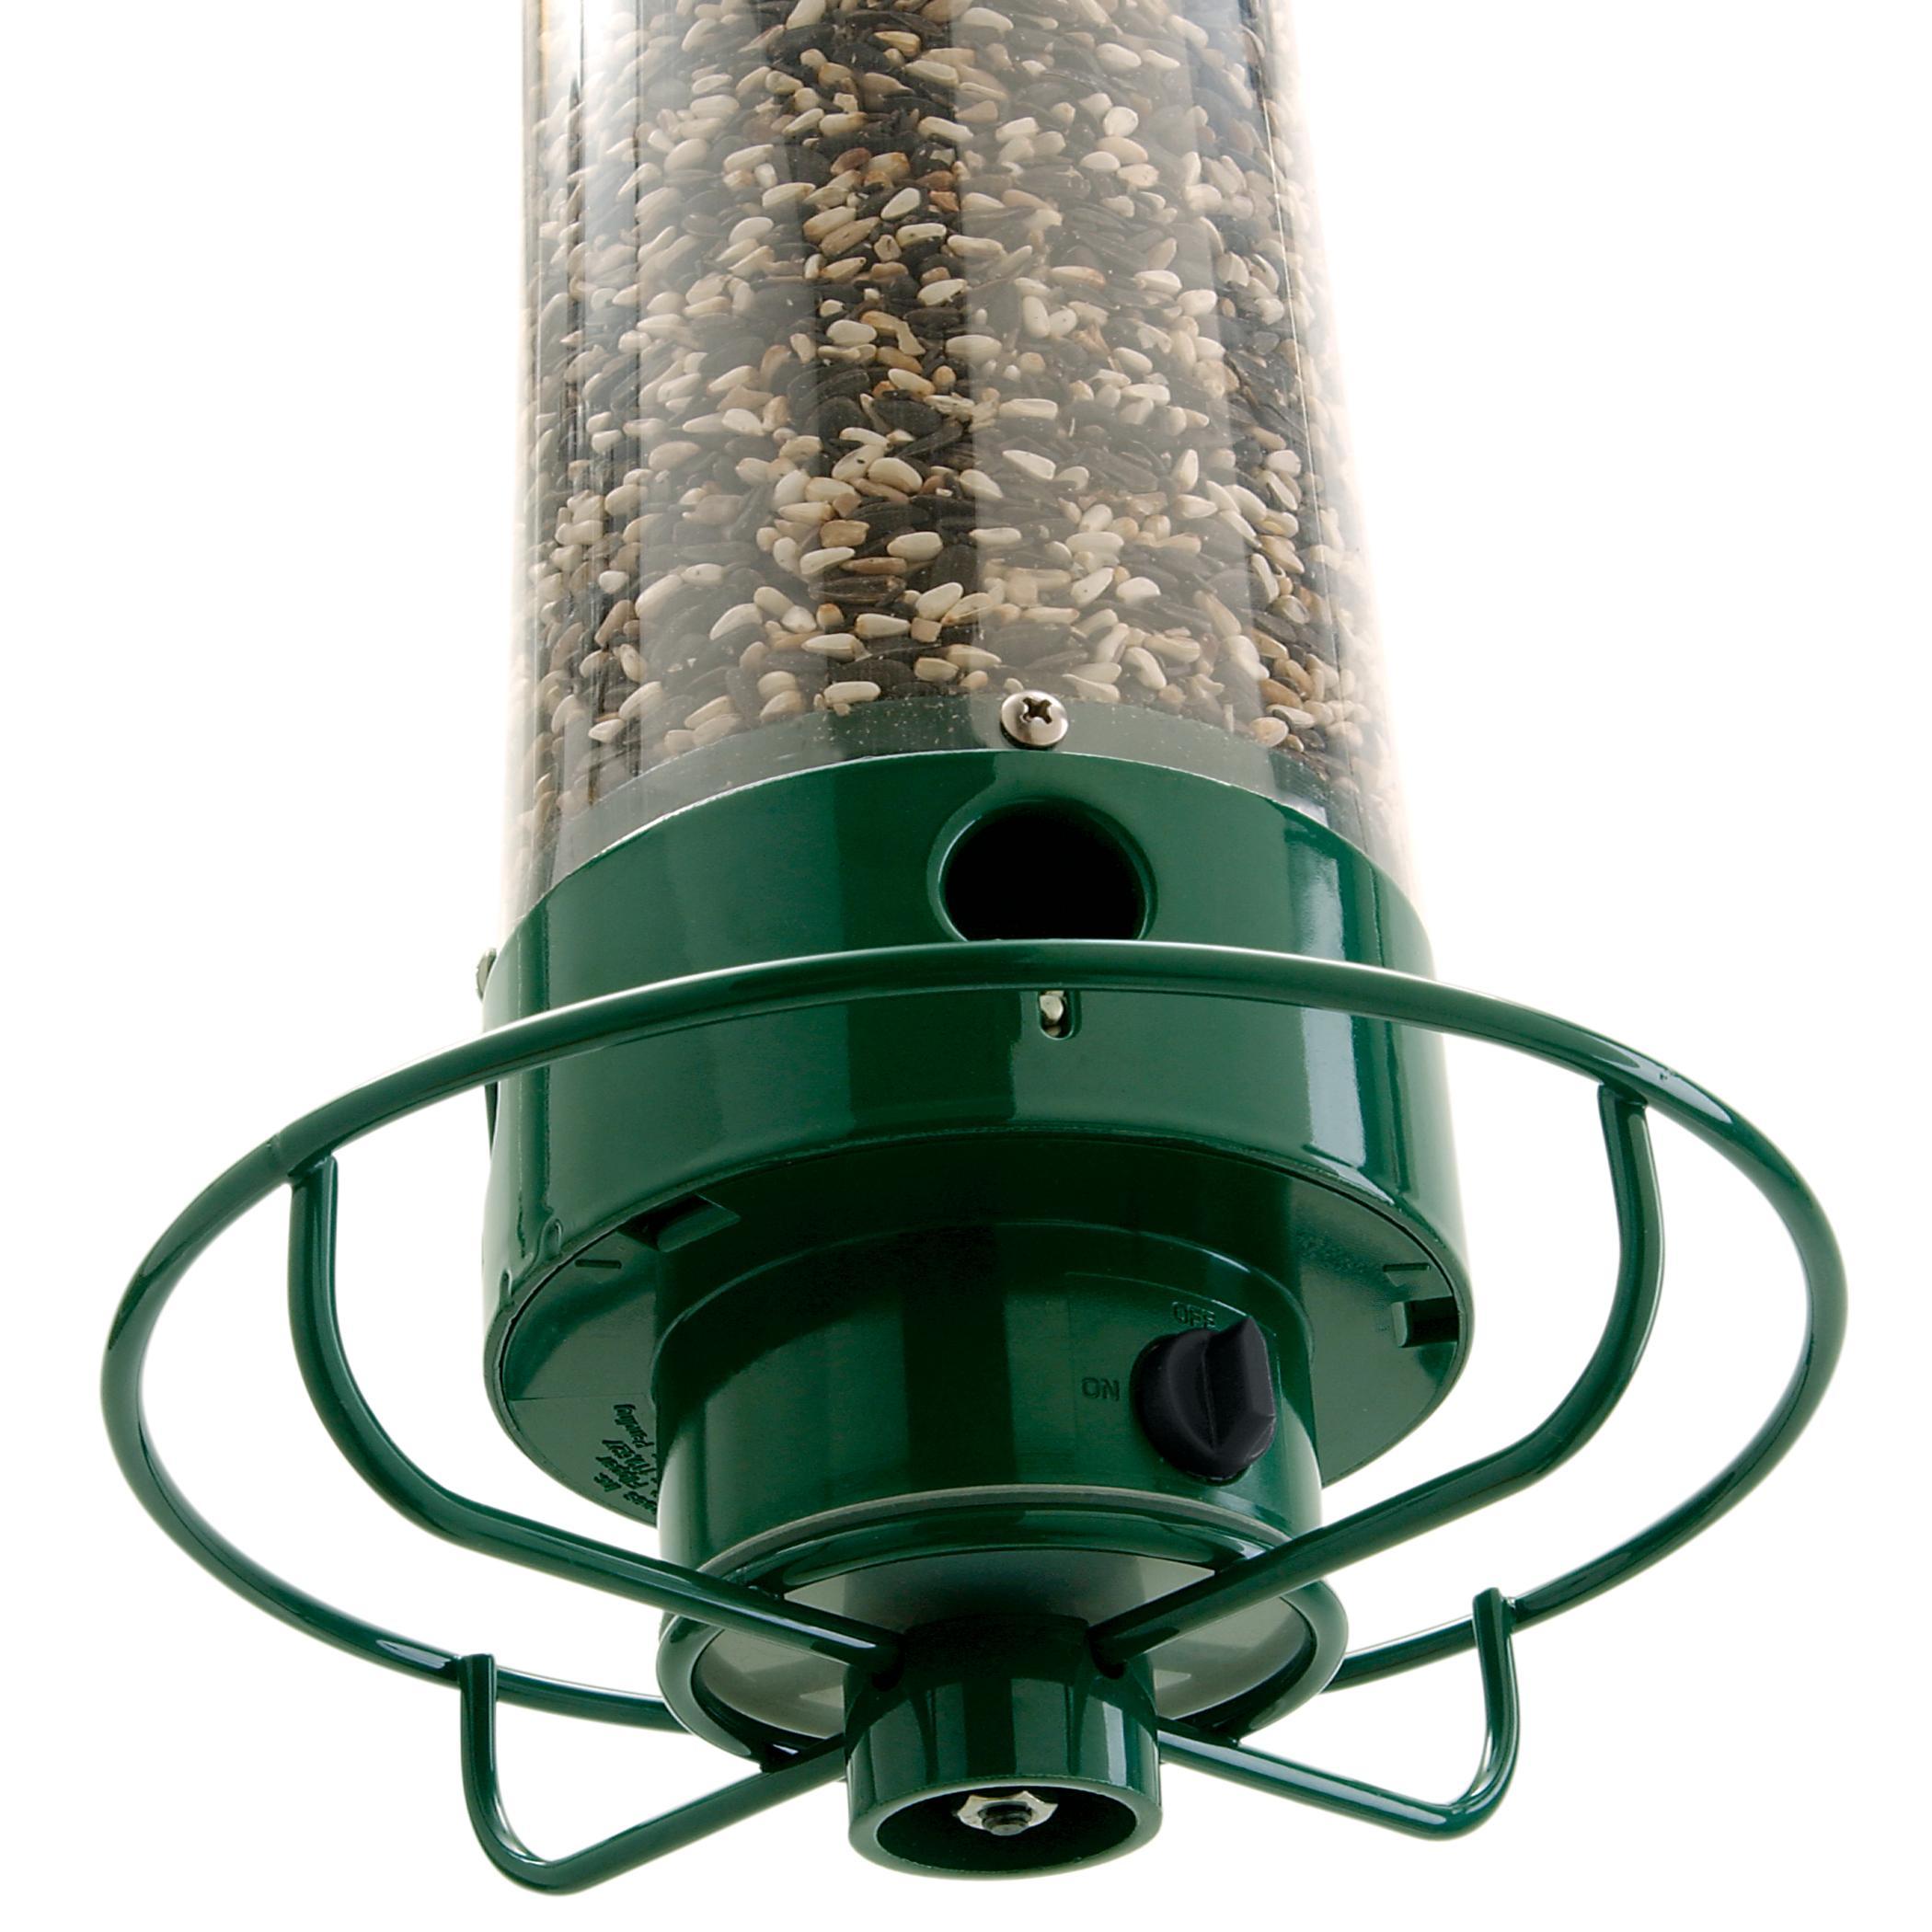 Amazon.com : Droll Yankees Squirrel Proof Bird Feeder